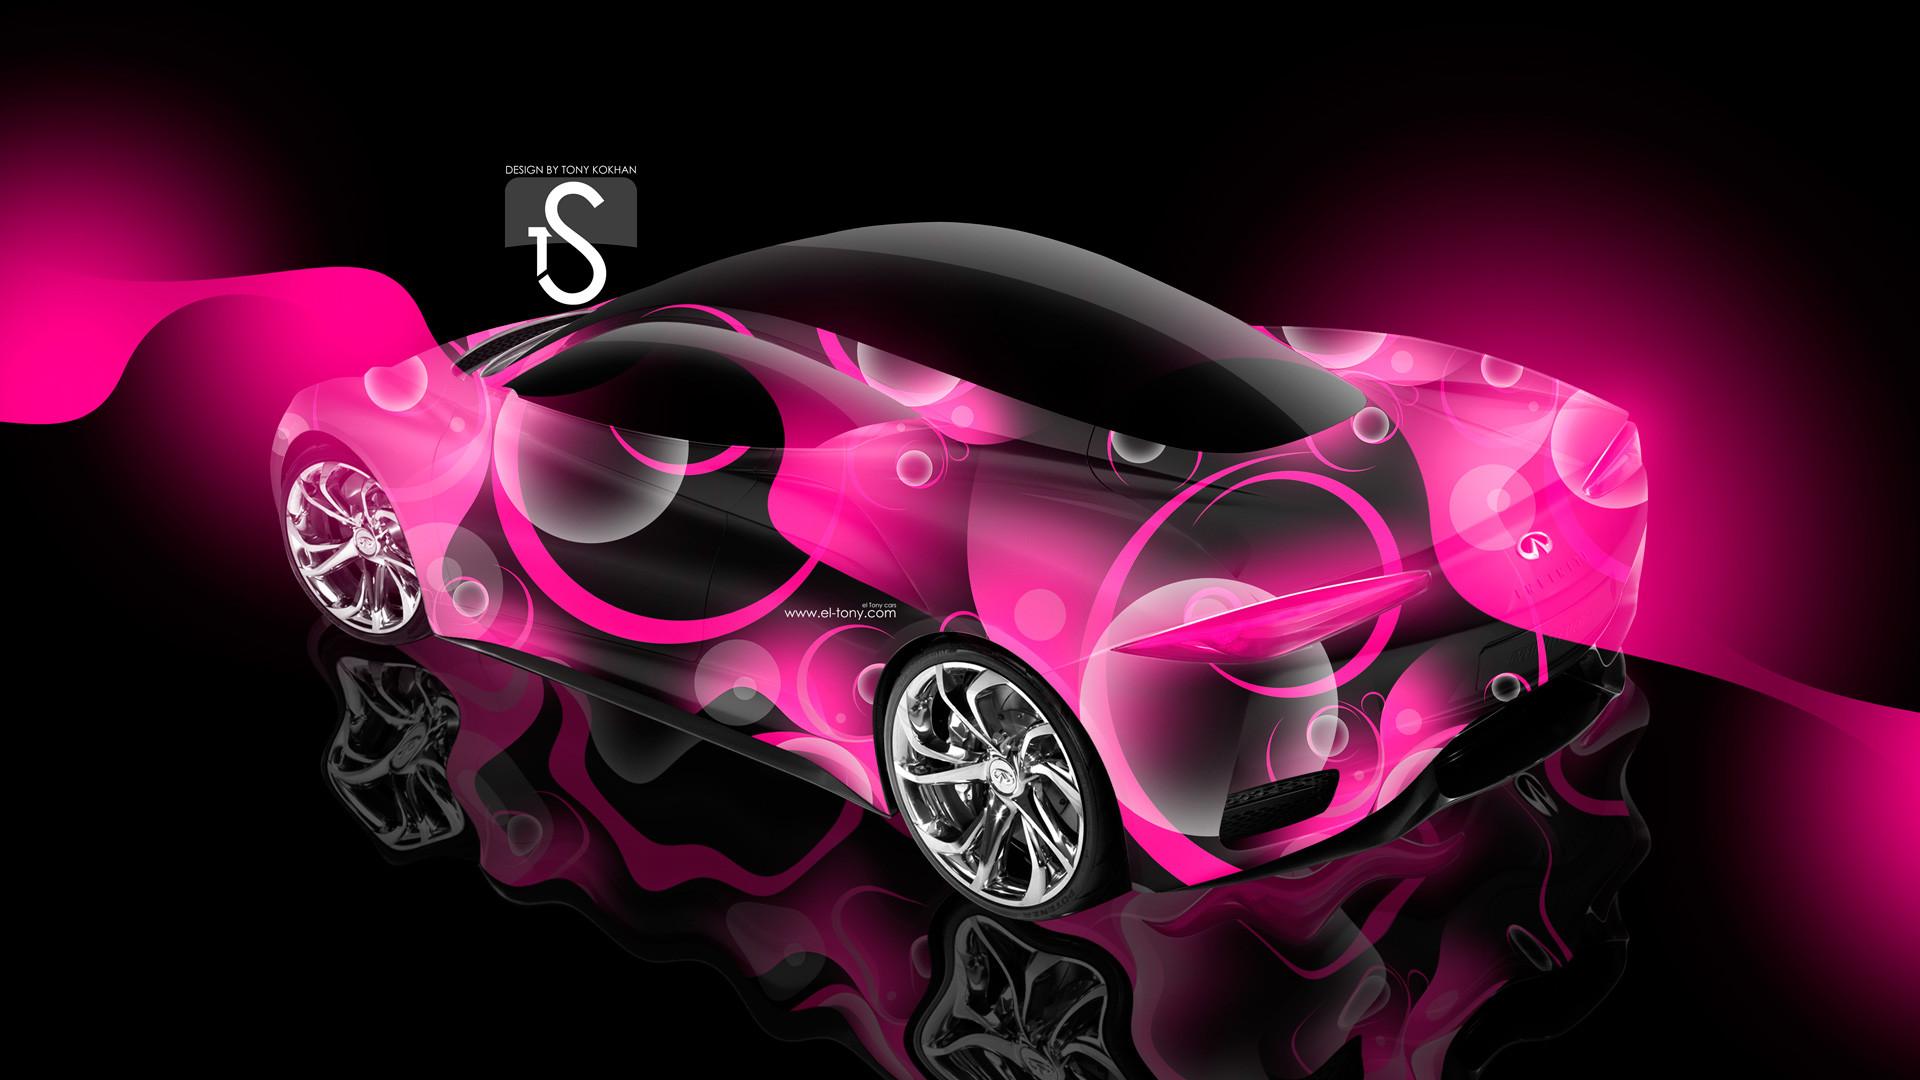 1920x1080 Bugatti Veyron Pink Neon Tiger Fantasy Plastic Car